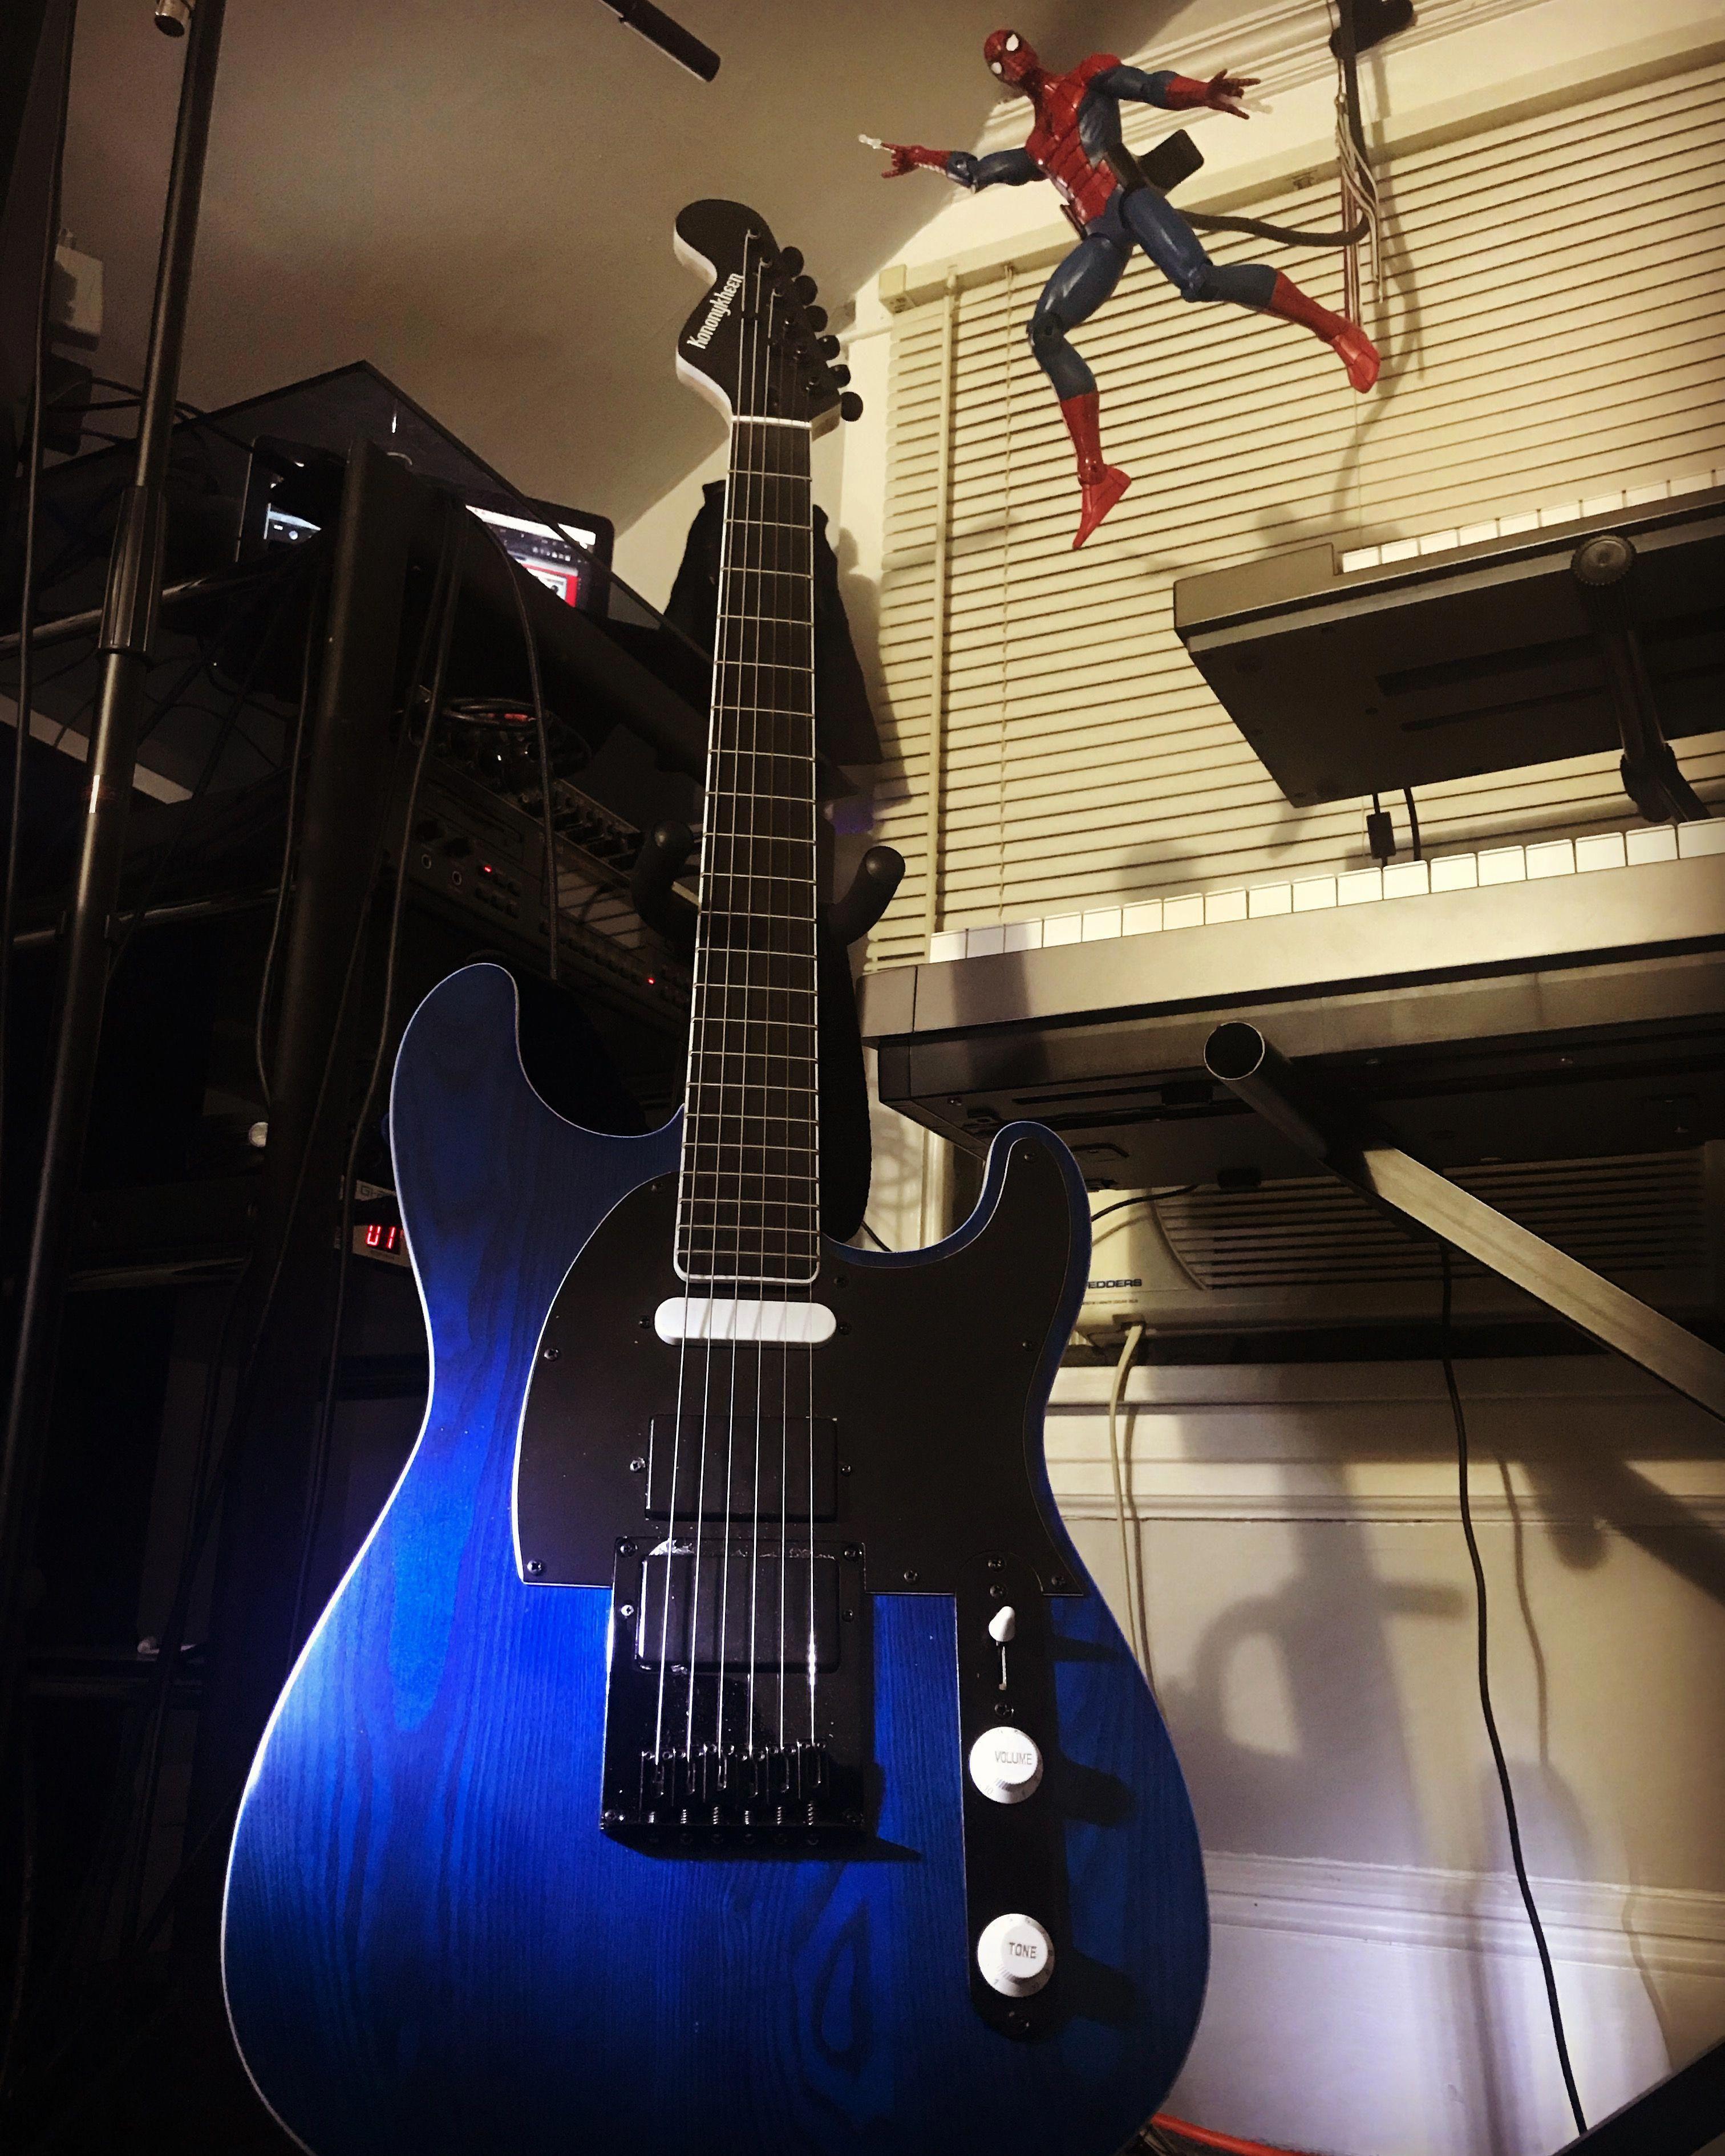 Vintage Guitars Which Is Best Quality Fenderguitars Fendertelecasterguitar With Images Guitar Fender Guitars